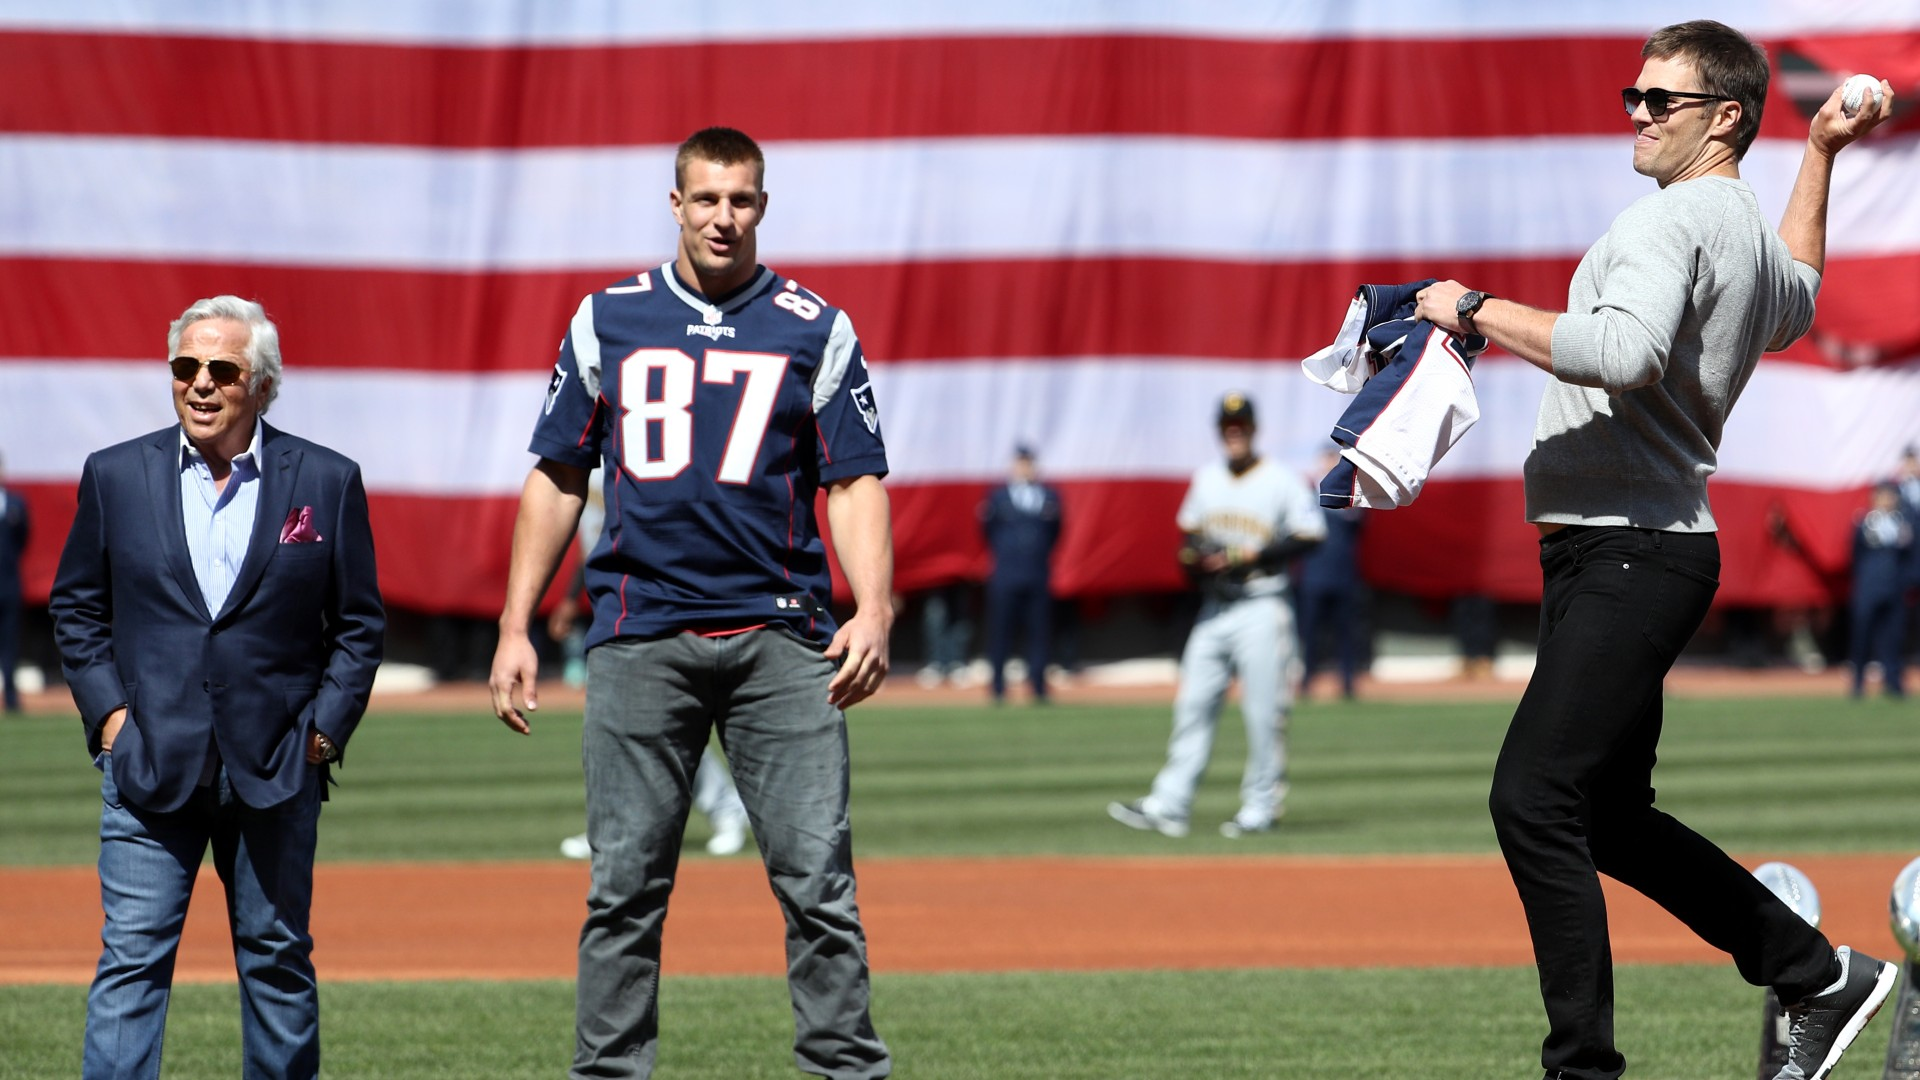 Tom Brady, Patrick Mahomes were both once Major League Baseball draft picks